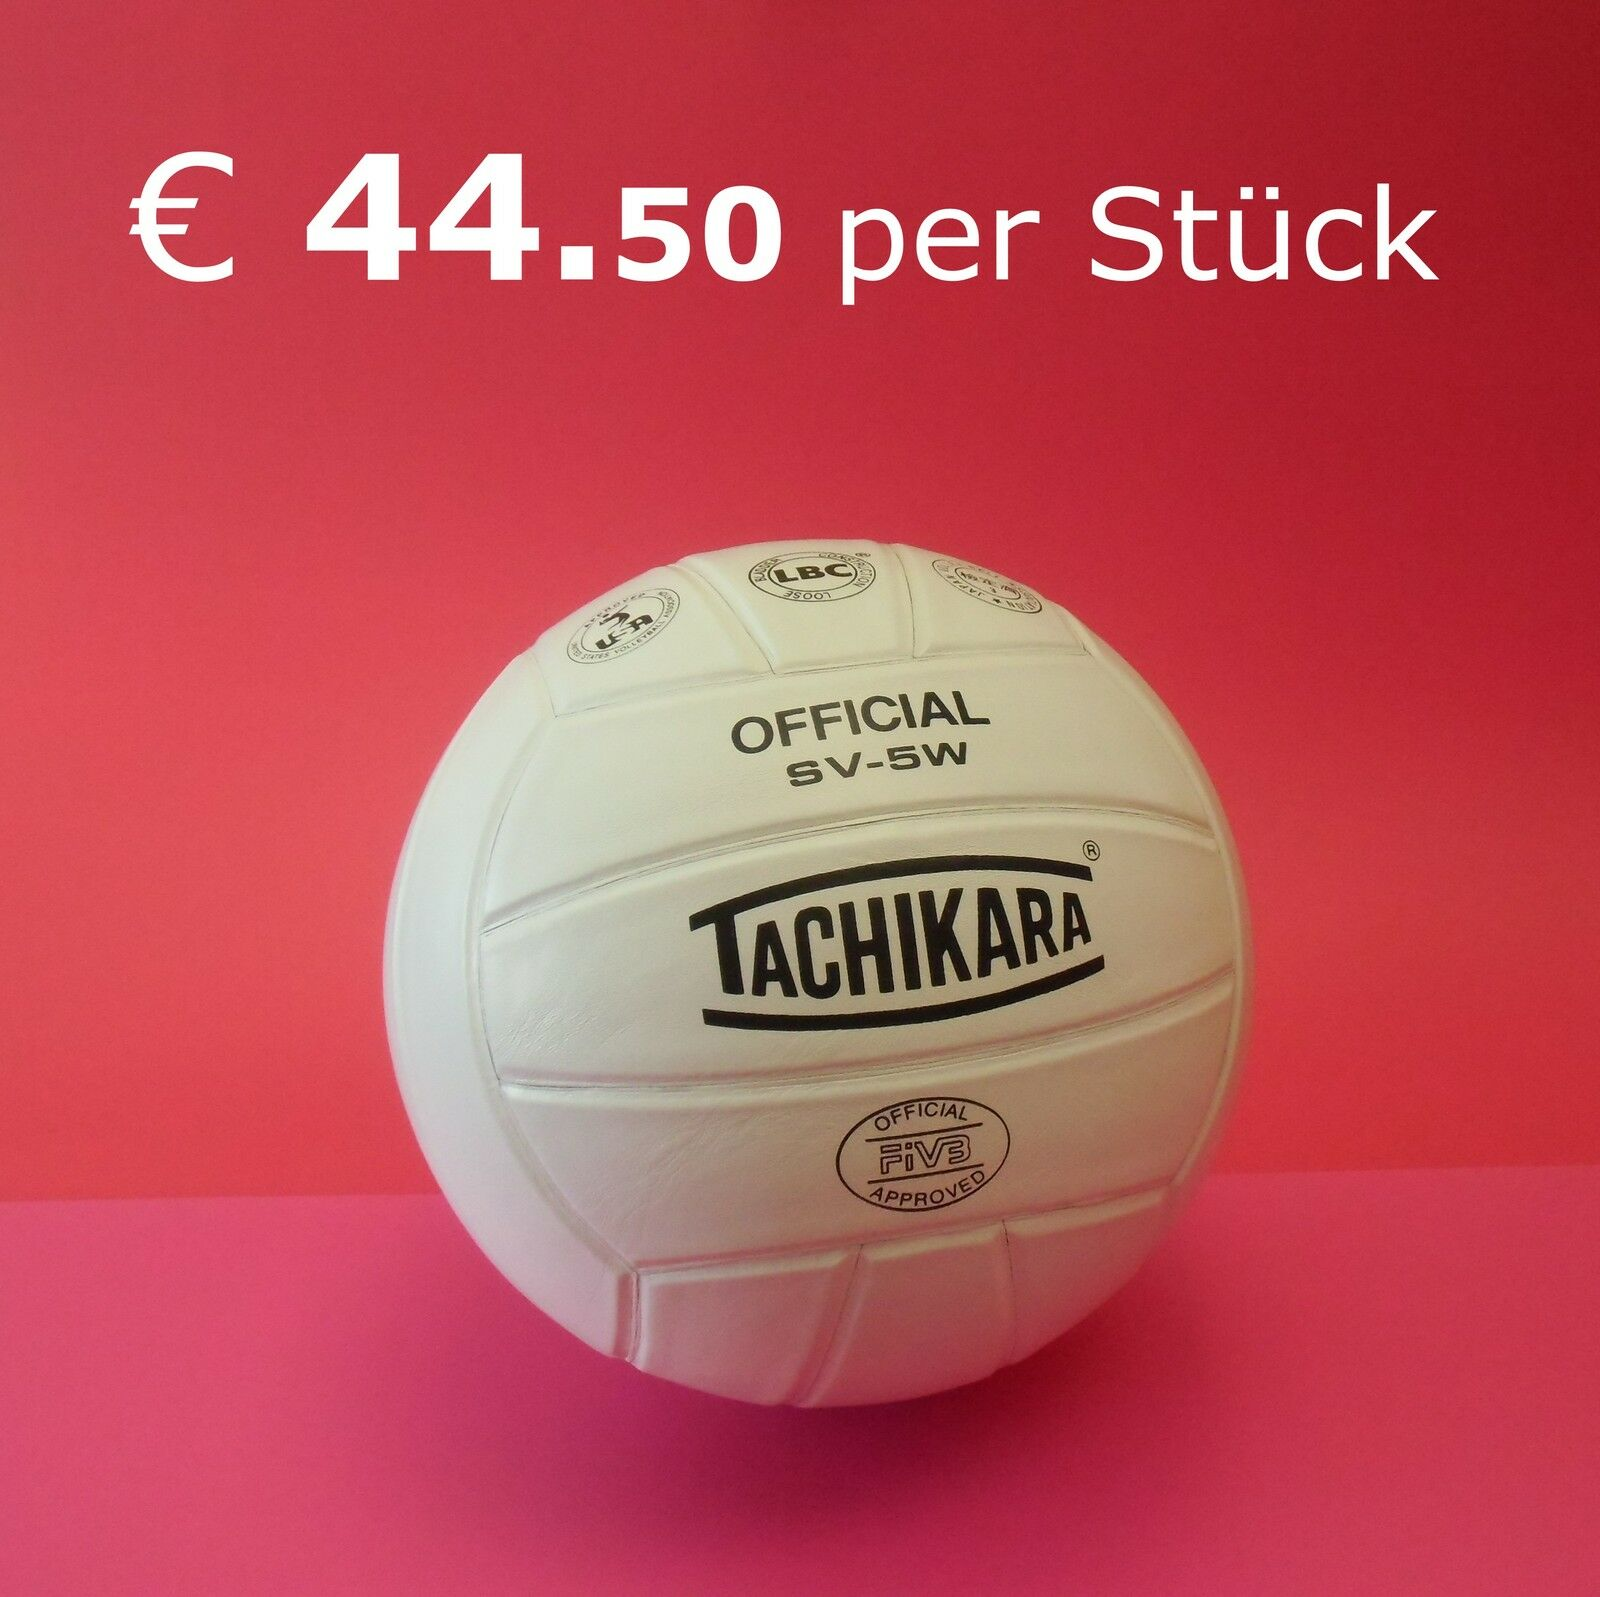 ►►TACHIKARA Official SV-5W  ► klassischer Edel-Volleyball aus aus aus Natur-Leder ►NEU 0fcabf